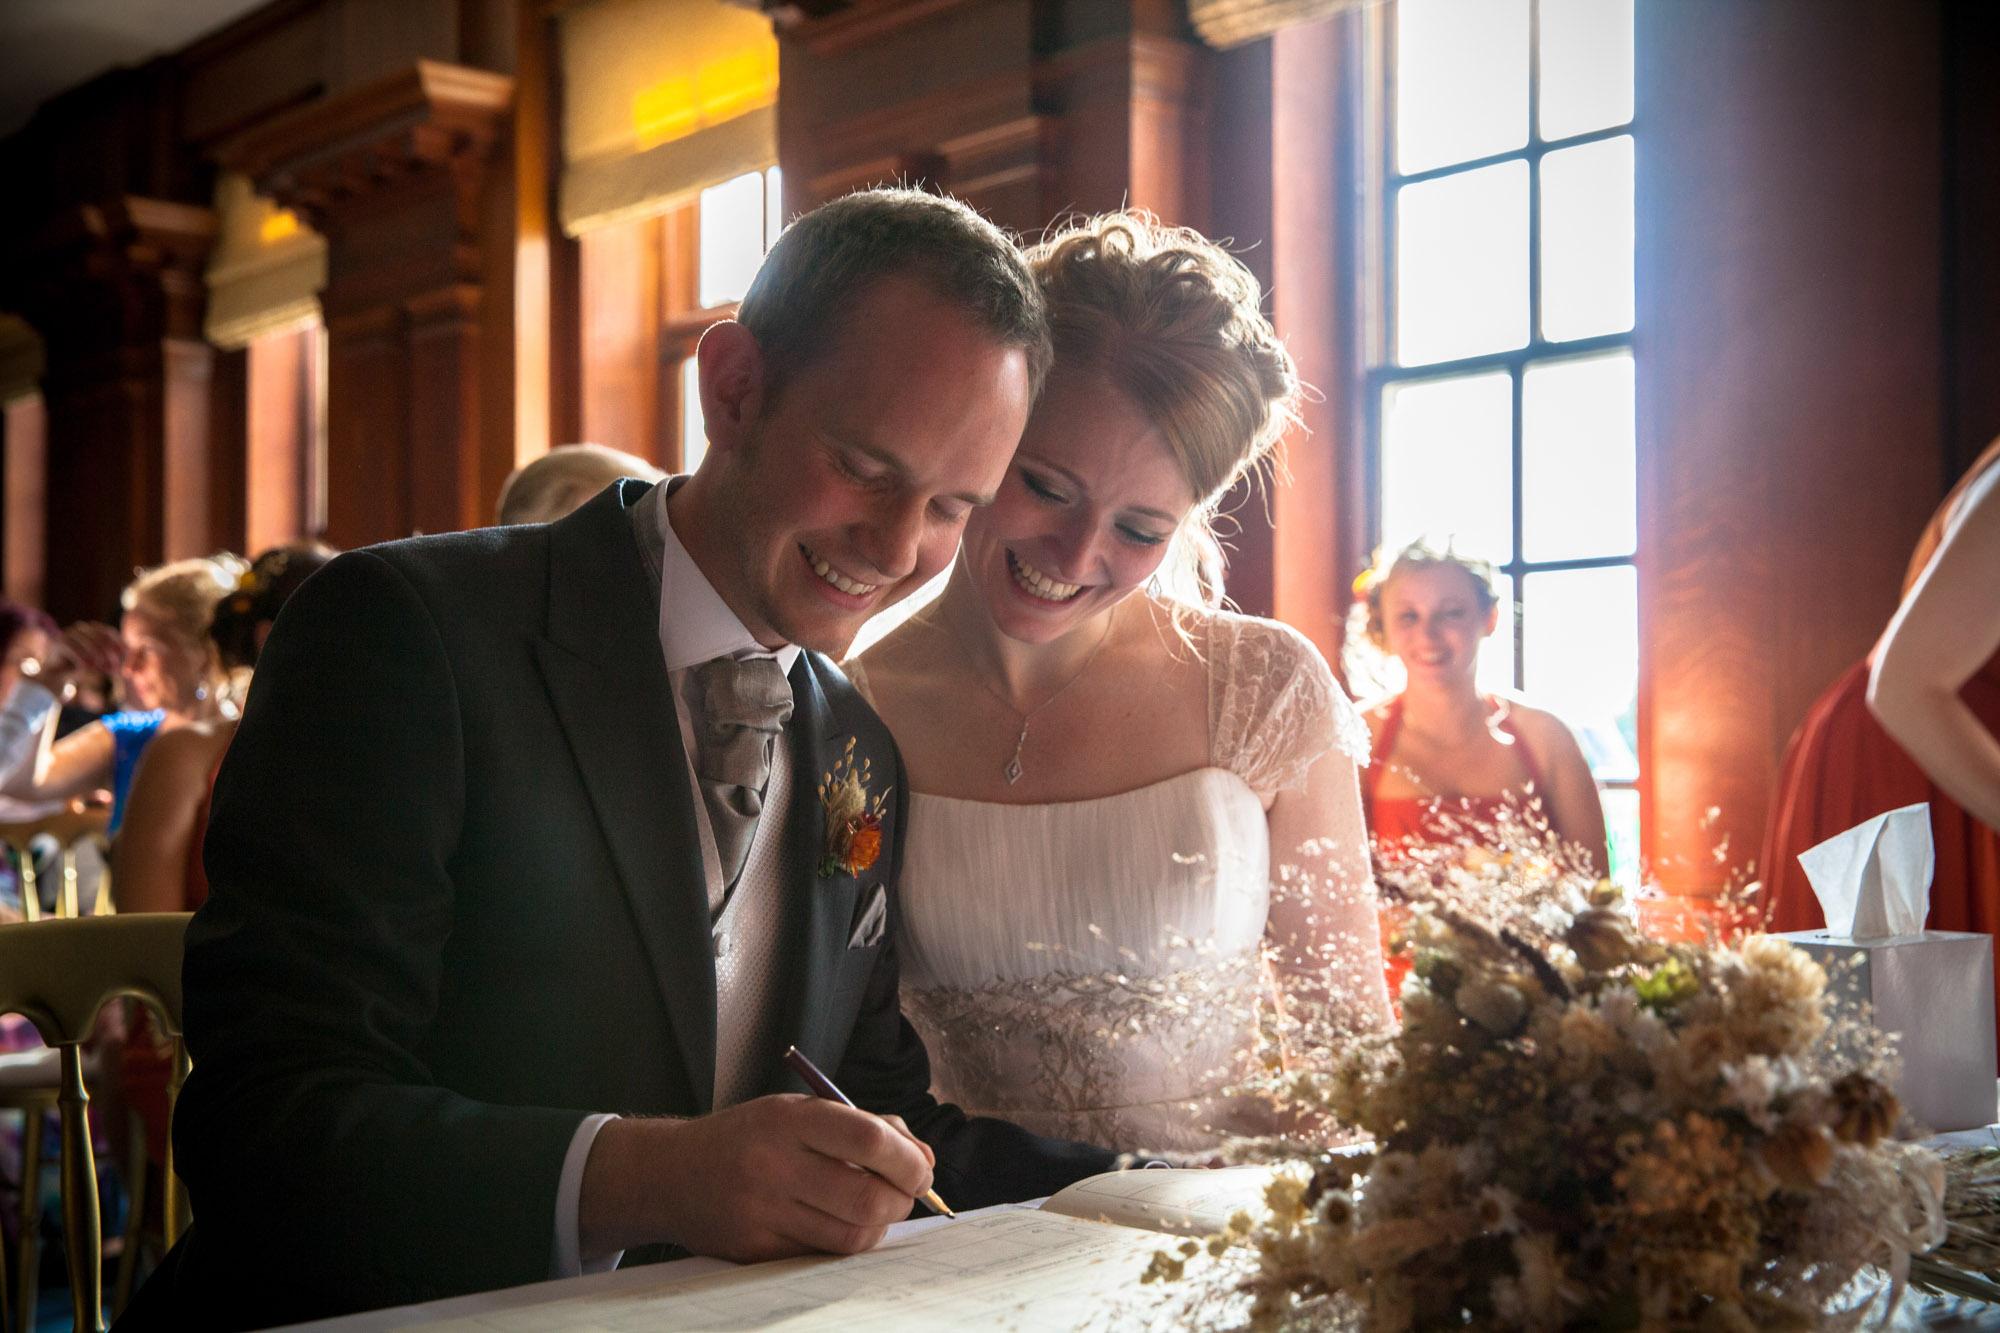 weddings-couples-love-photographer-oxford-london-jonathan-self-photography-38.jpg